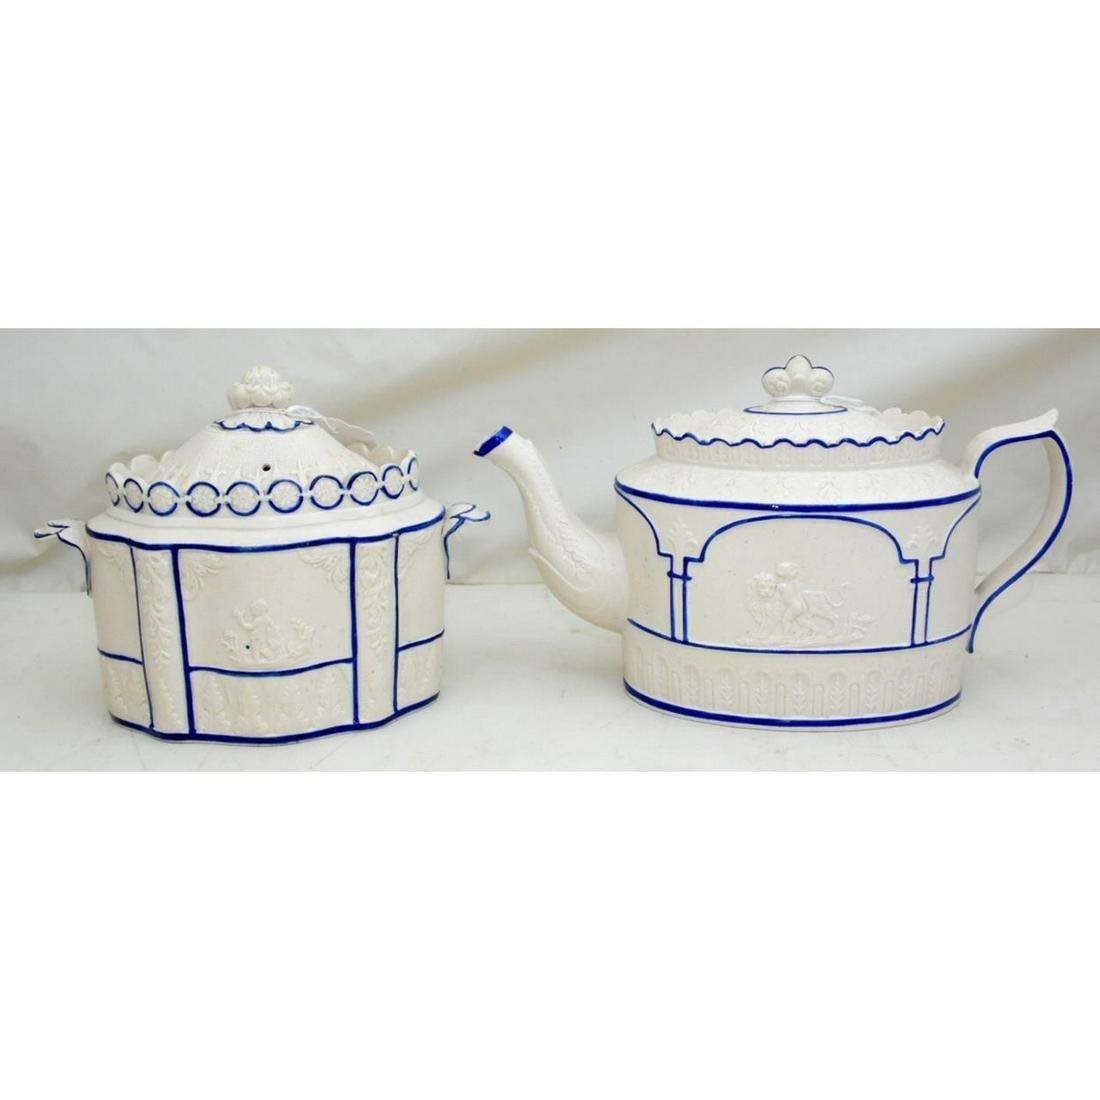 Scarce Geo.Castleford Pottery Teapot & Sugar Bowl